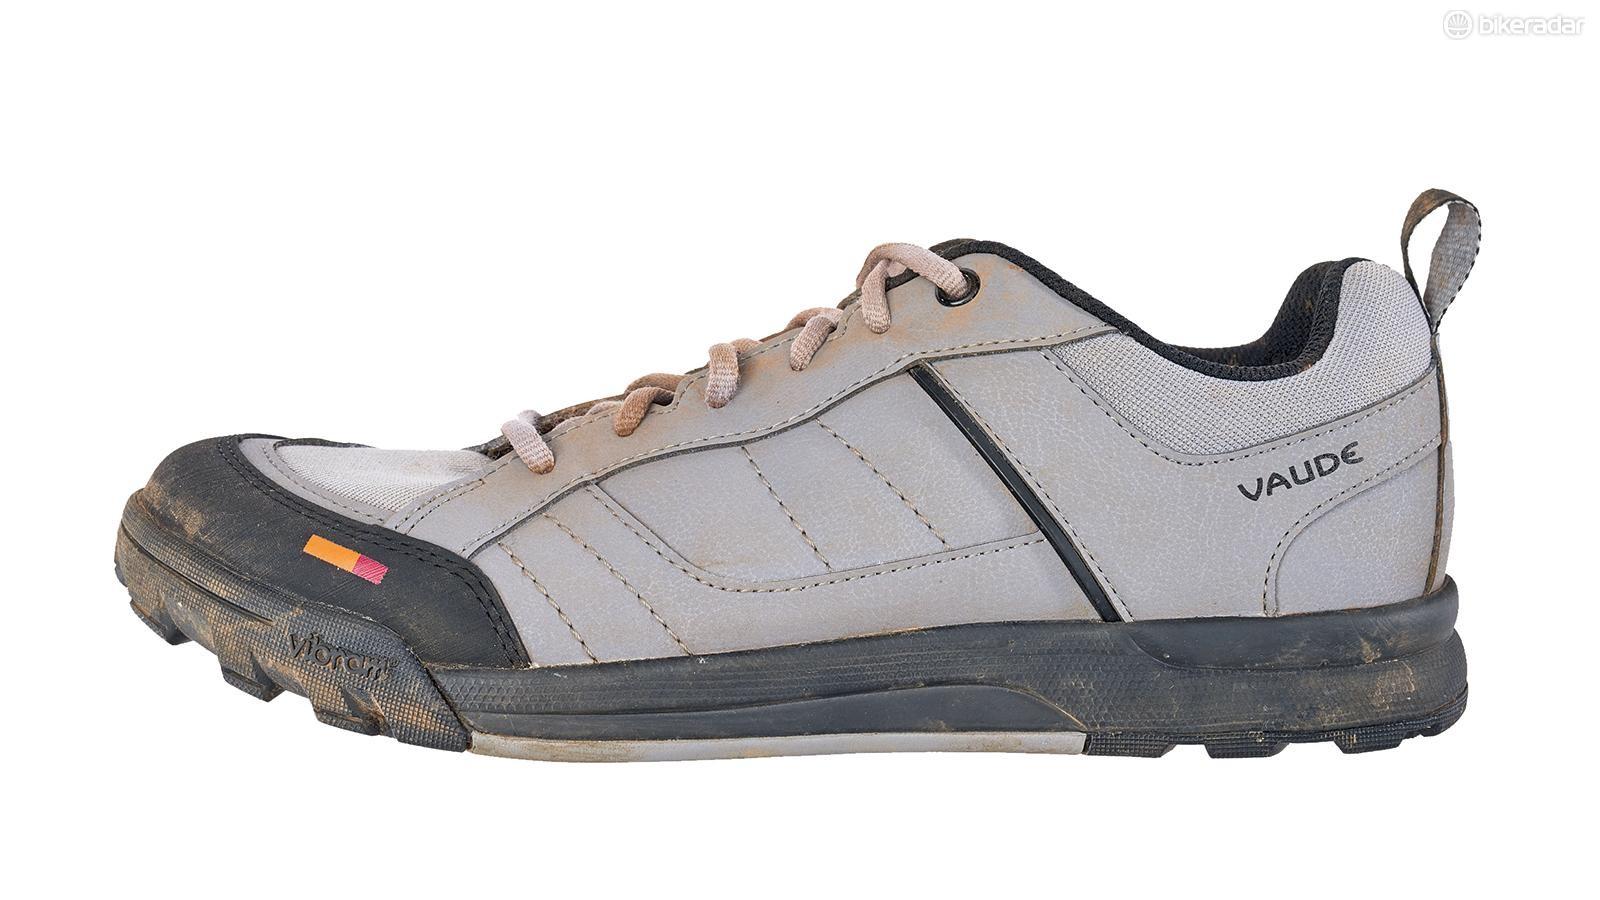 Vaude's Moab AM flat MTB shoe